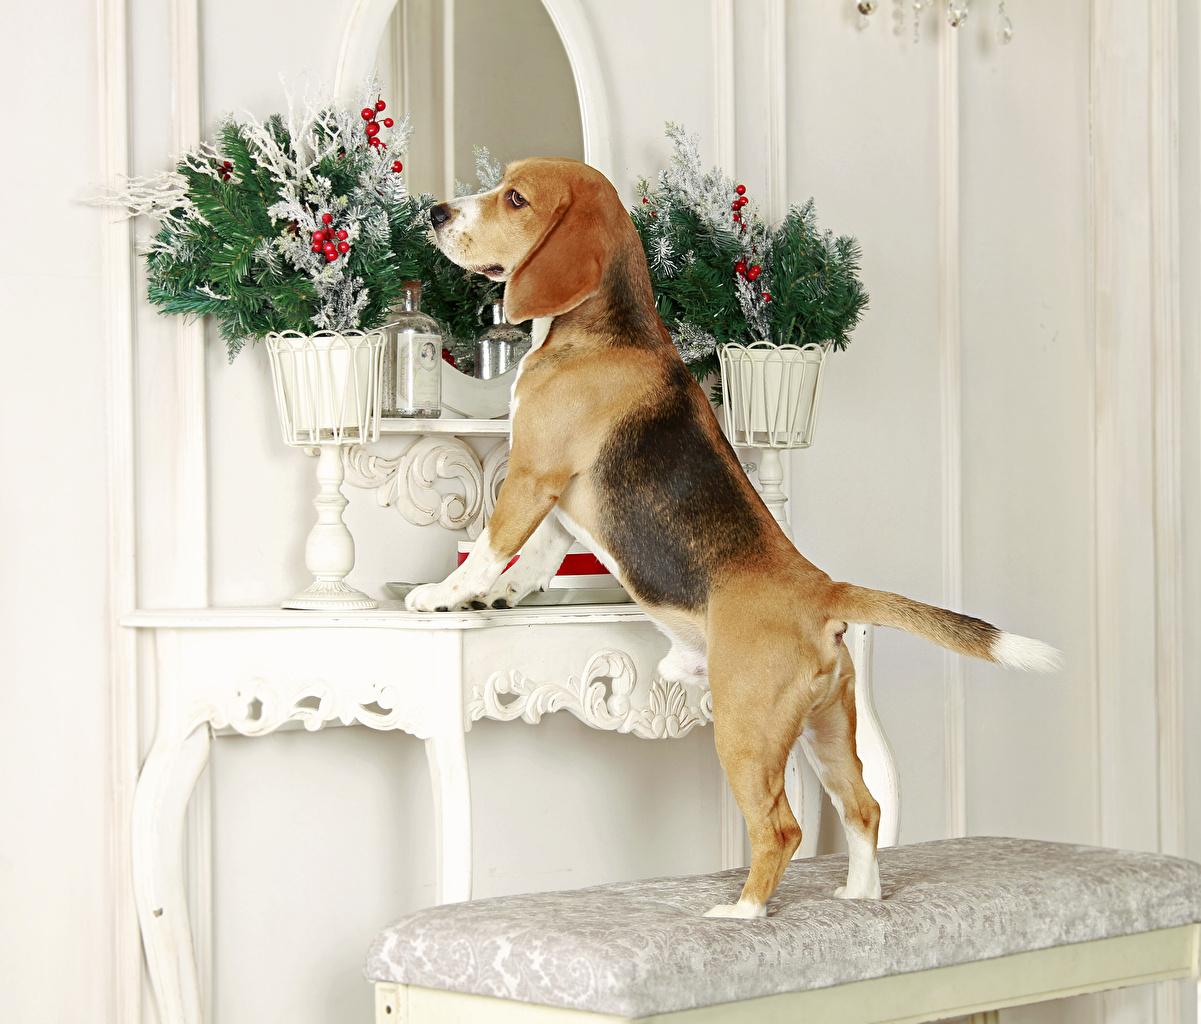 Картинки бигля собака вазе Животные Бигль Собаки вазы Ваза животное